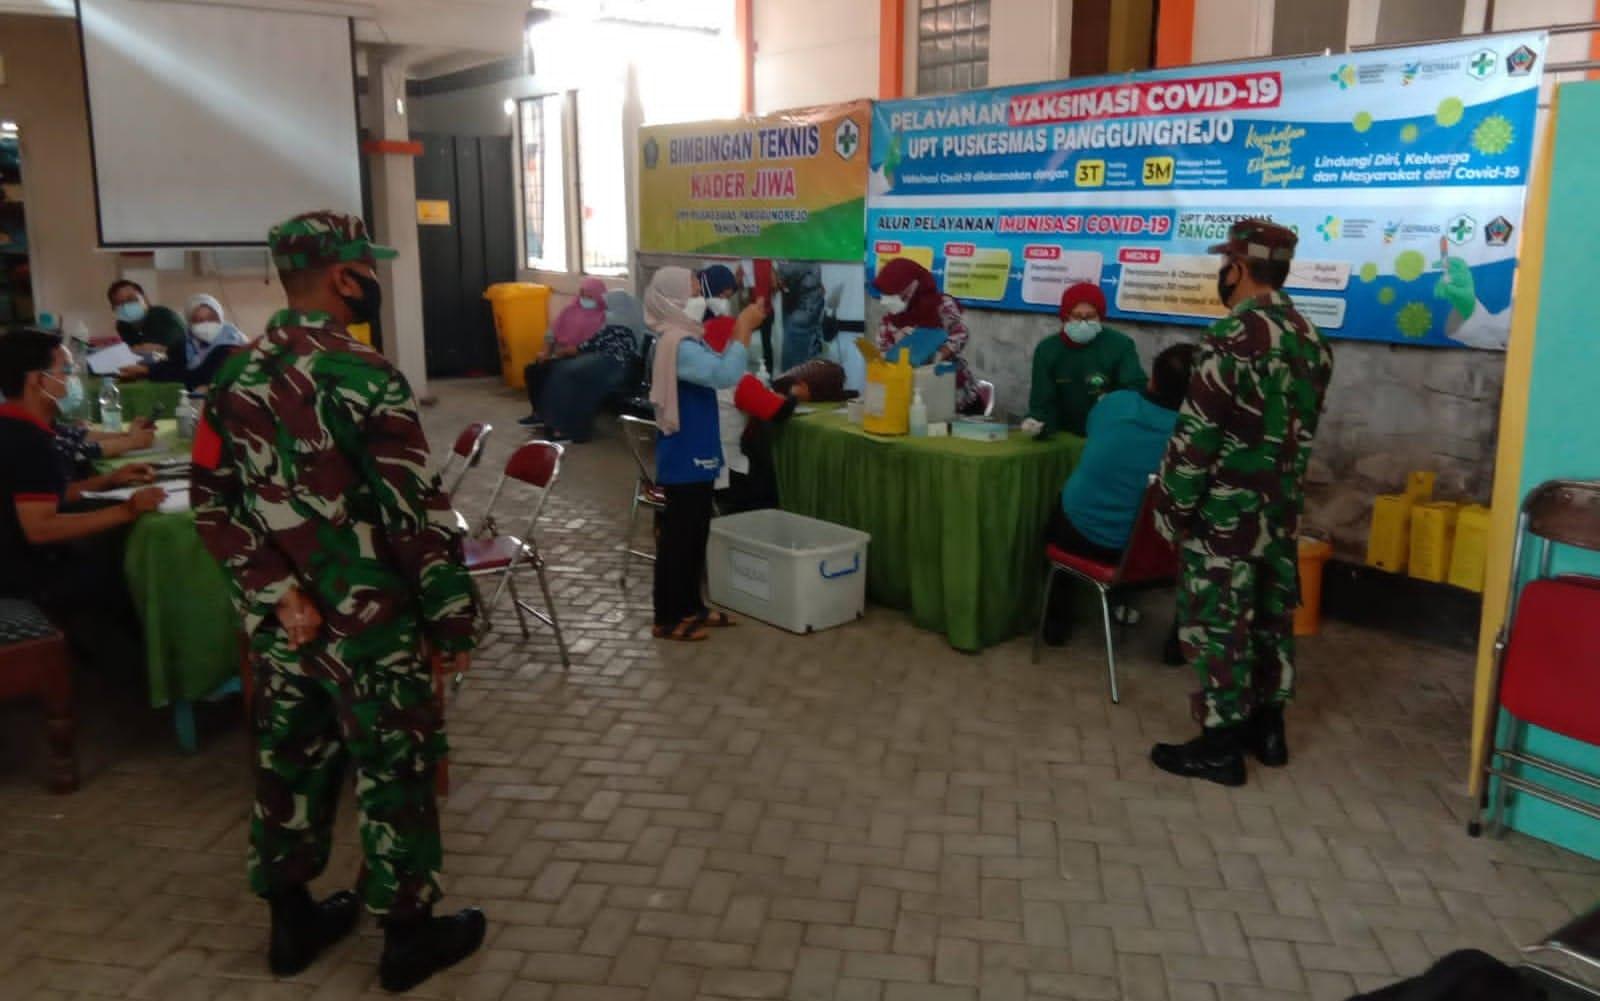 Photo of Babinsa Panggungrejo Blitar : Vaksin Covid-19 Aman dan Halal, Masyarakat Tidak Usah Takut